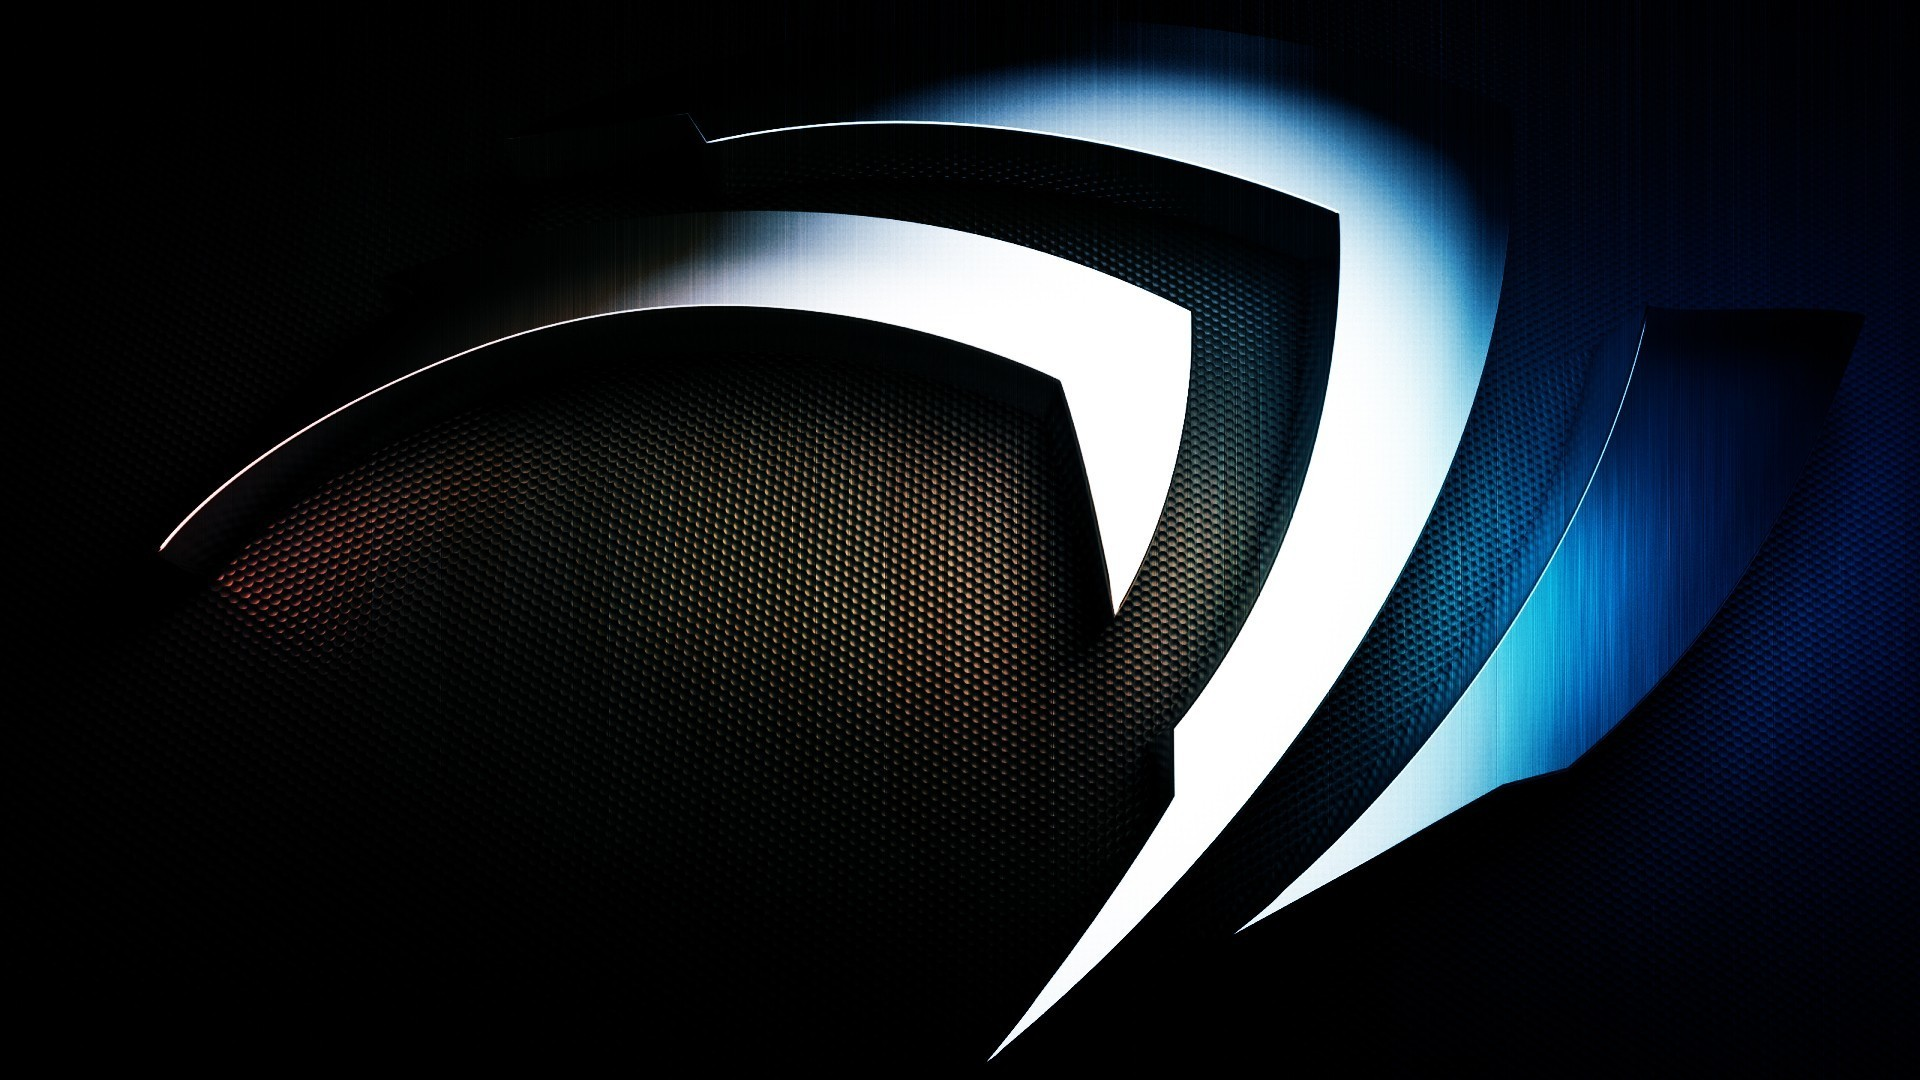 nvidia Computer Wallpapers, Desktop Backgrounds | | ID .